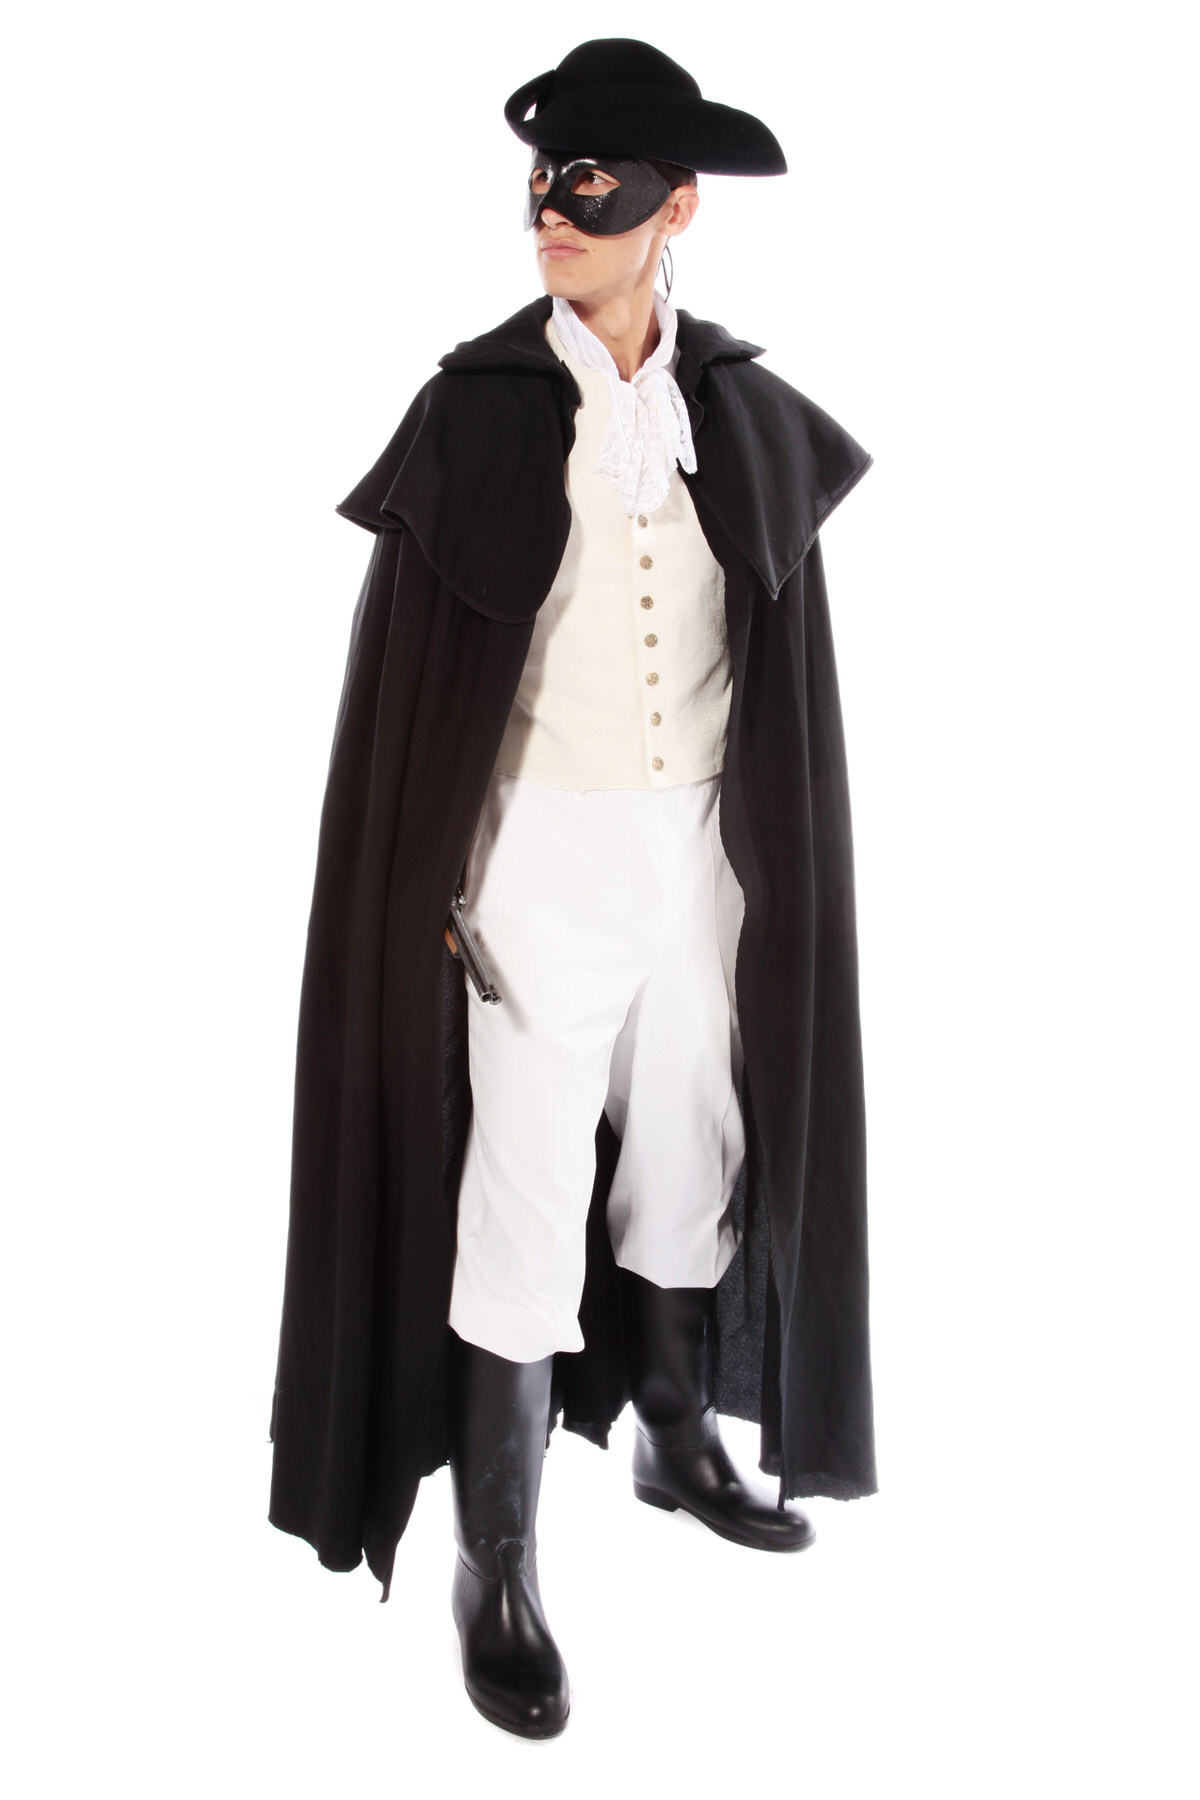 DICK TURPIN HIGHWAYMAN COSTUME W MASK & TRICORN HAT